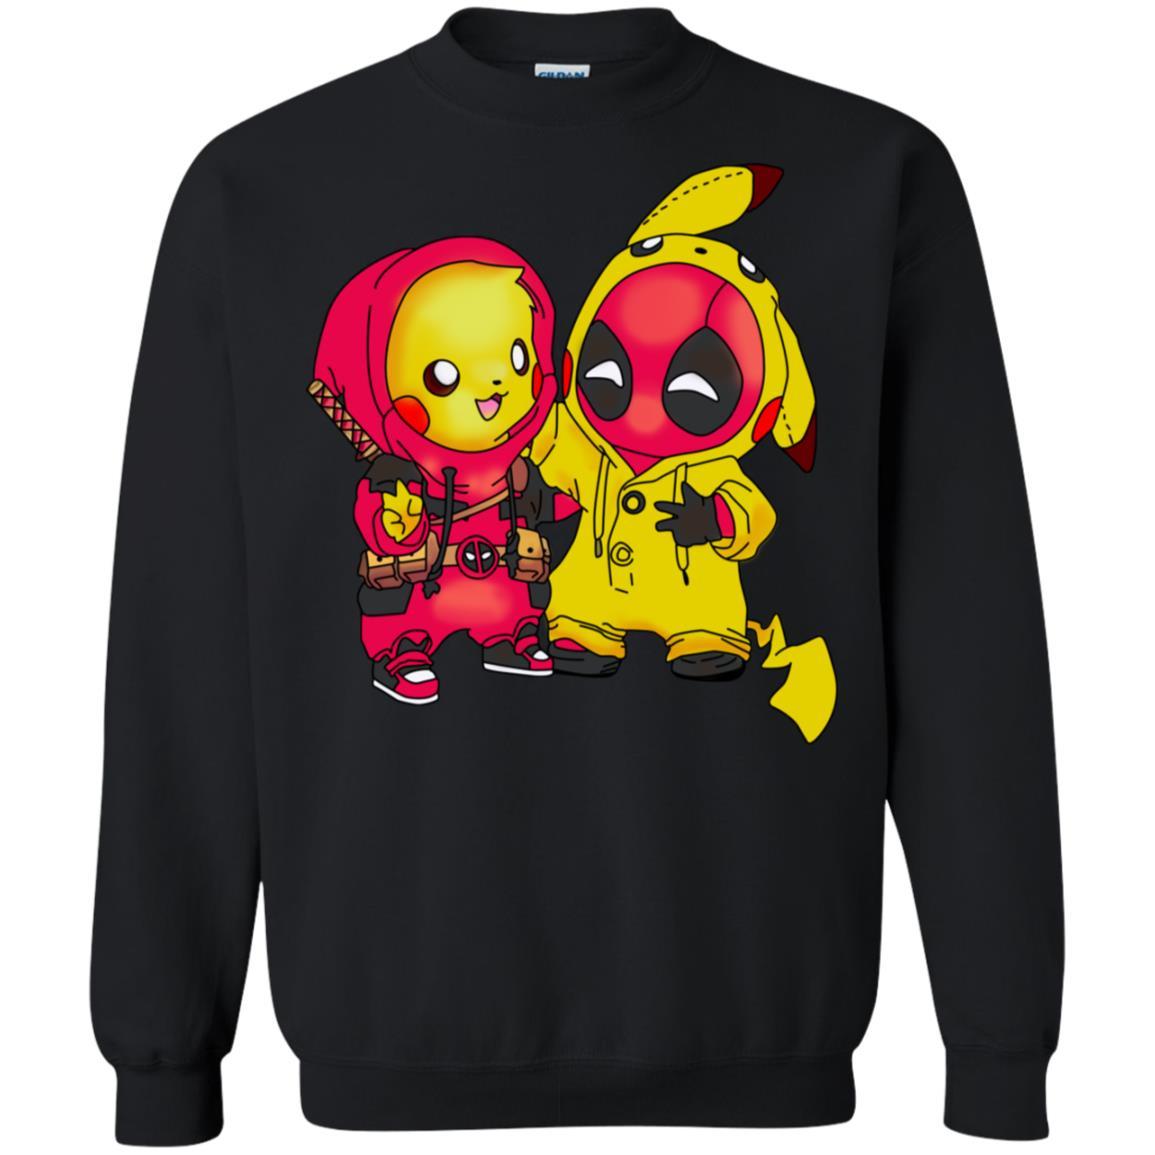 43acf35ed442 Baby Pokemon Pikachu and Deadpool T shirt, Ls, Sweatshirt ...